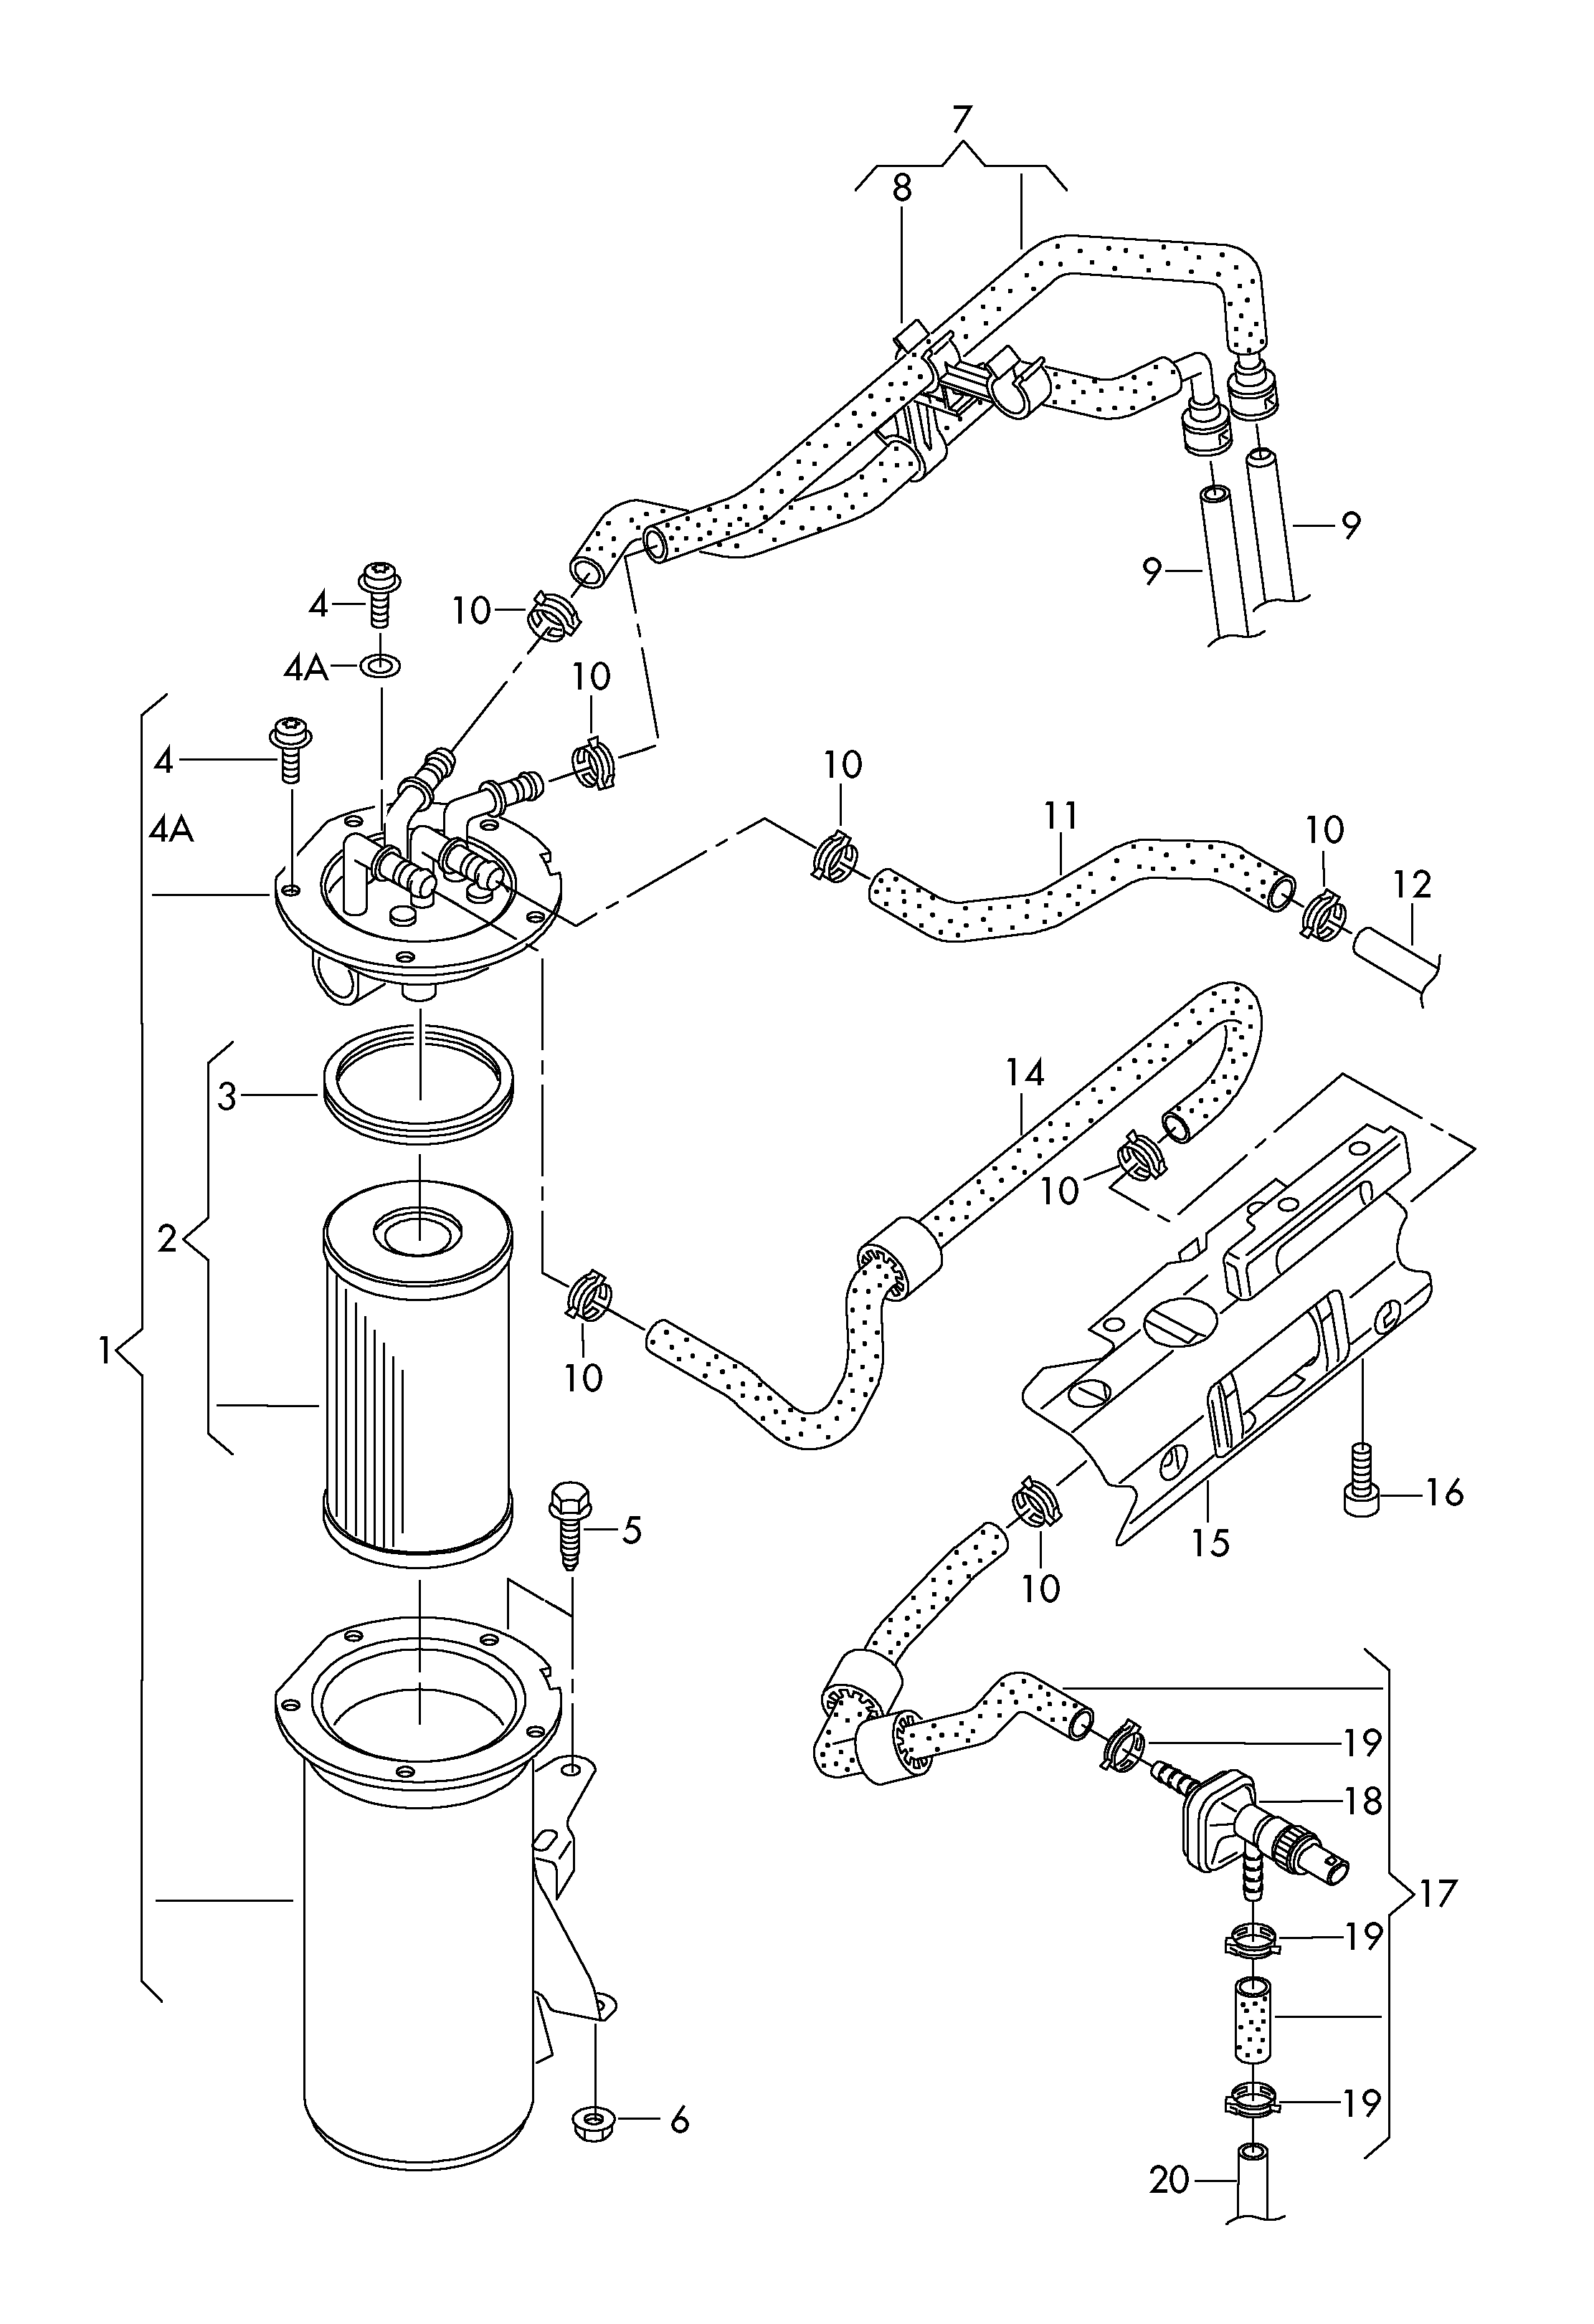 Volkswagen Jetta (2011 - 2014) / VAG Etka